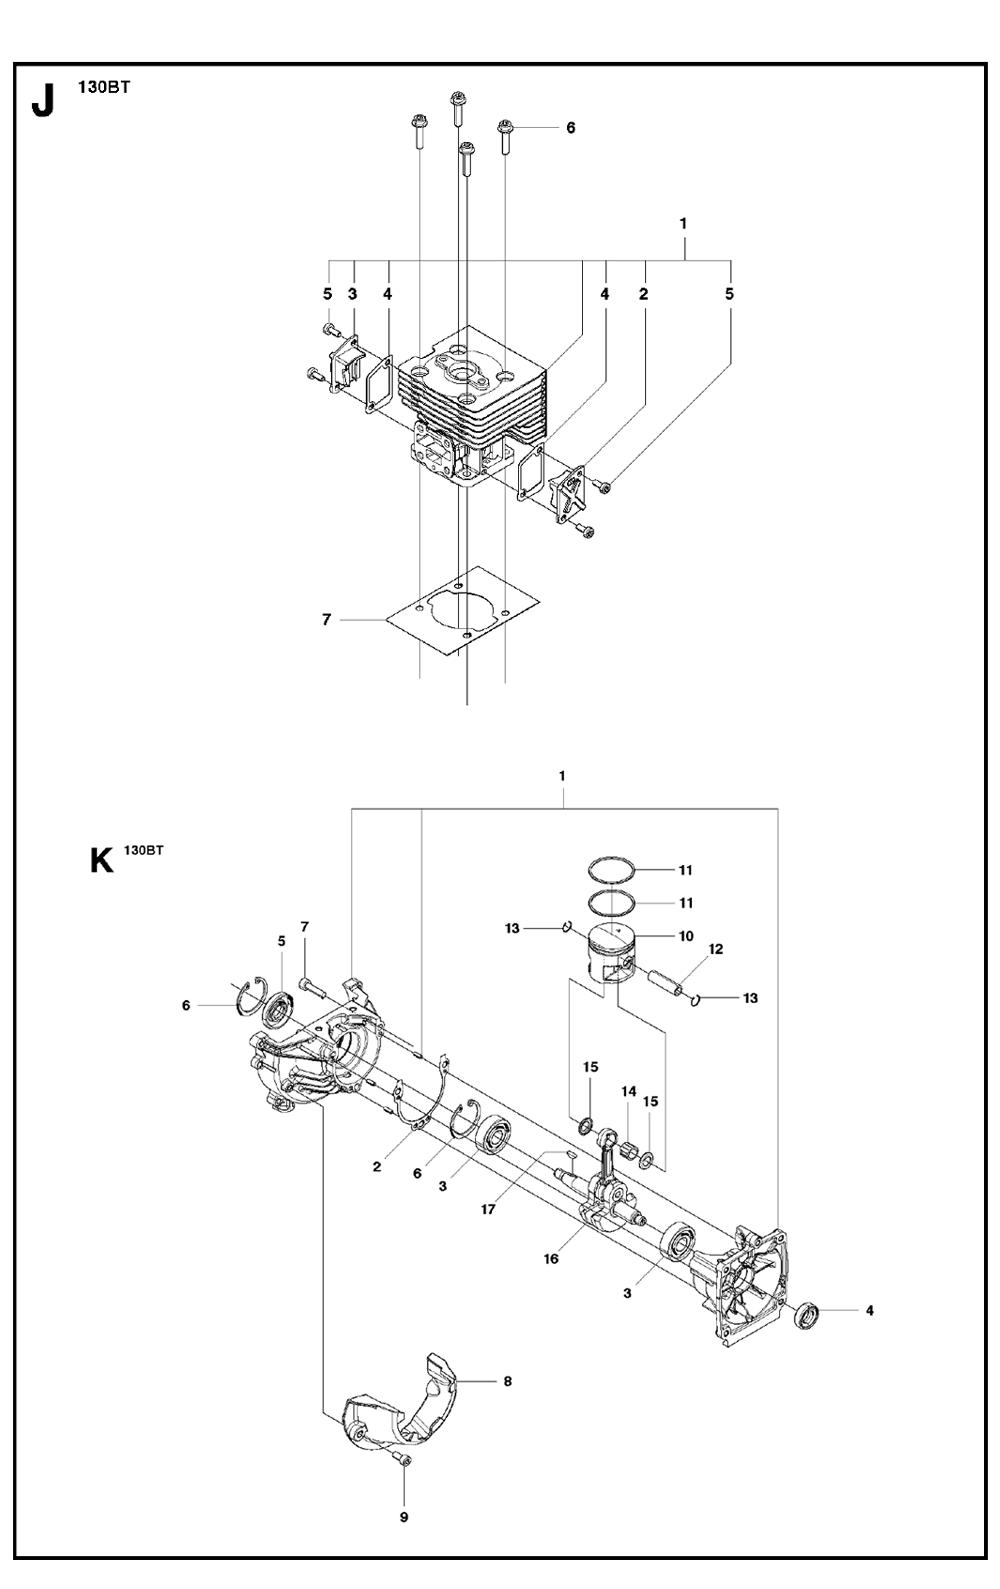 Buy Husqvarna 130BT Type-3 Replacement Tool Parts